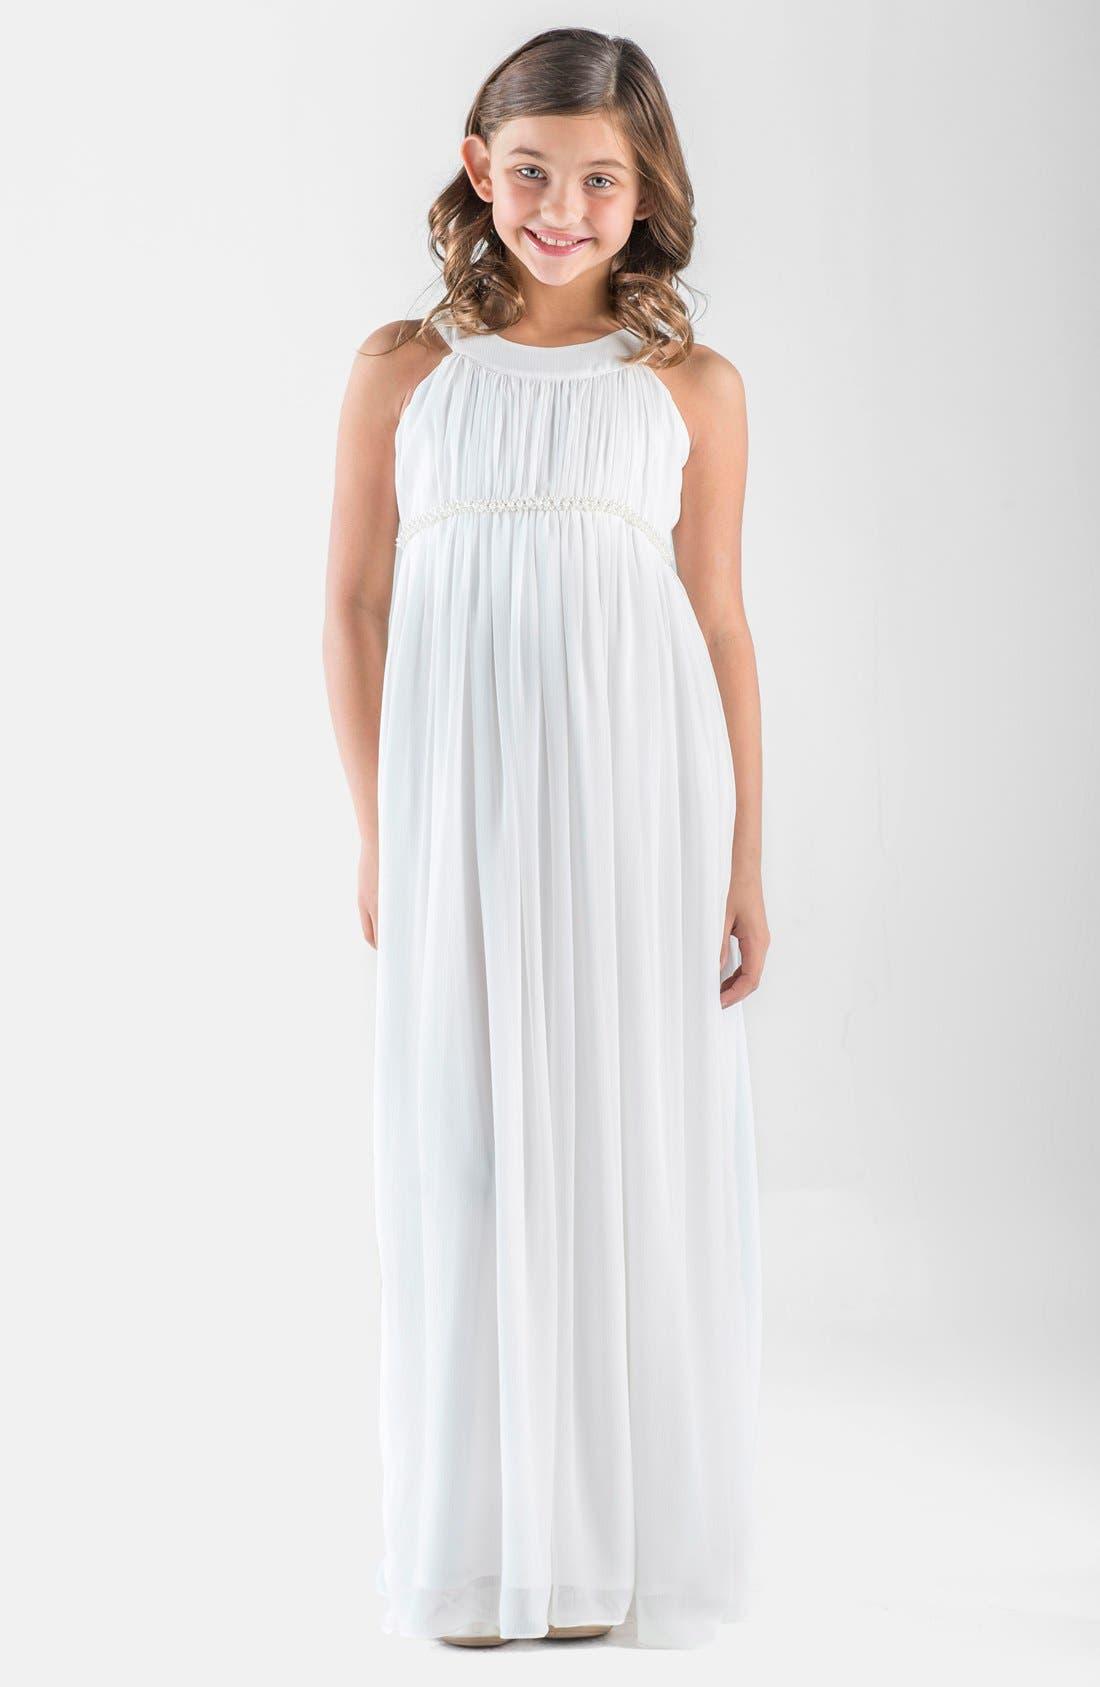 Grecian Dresses for Women